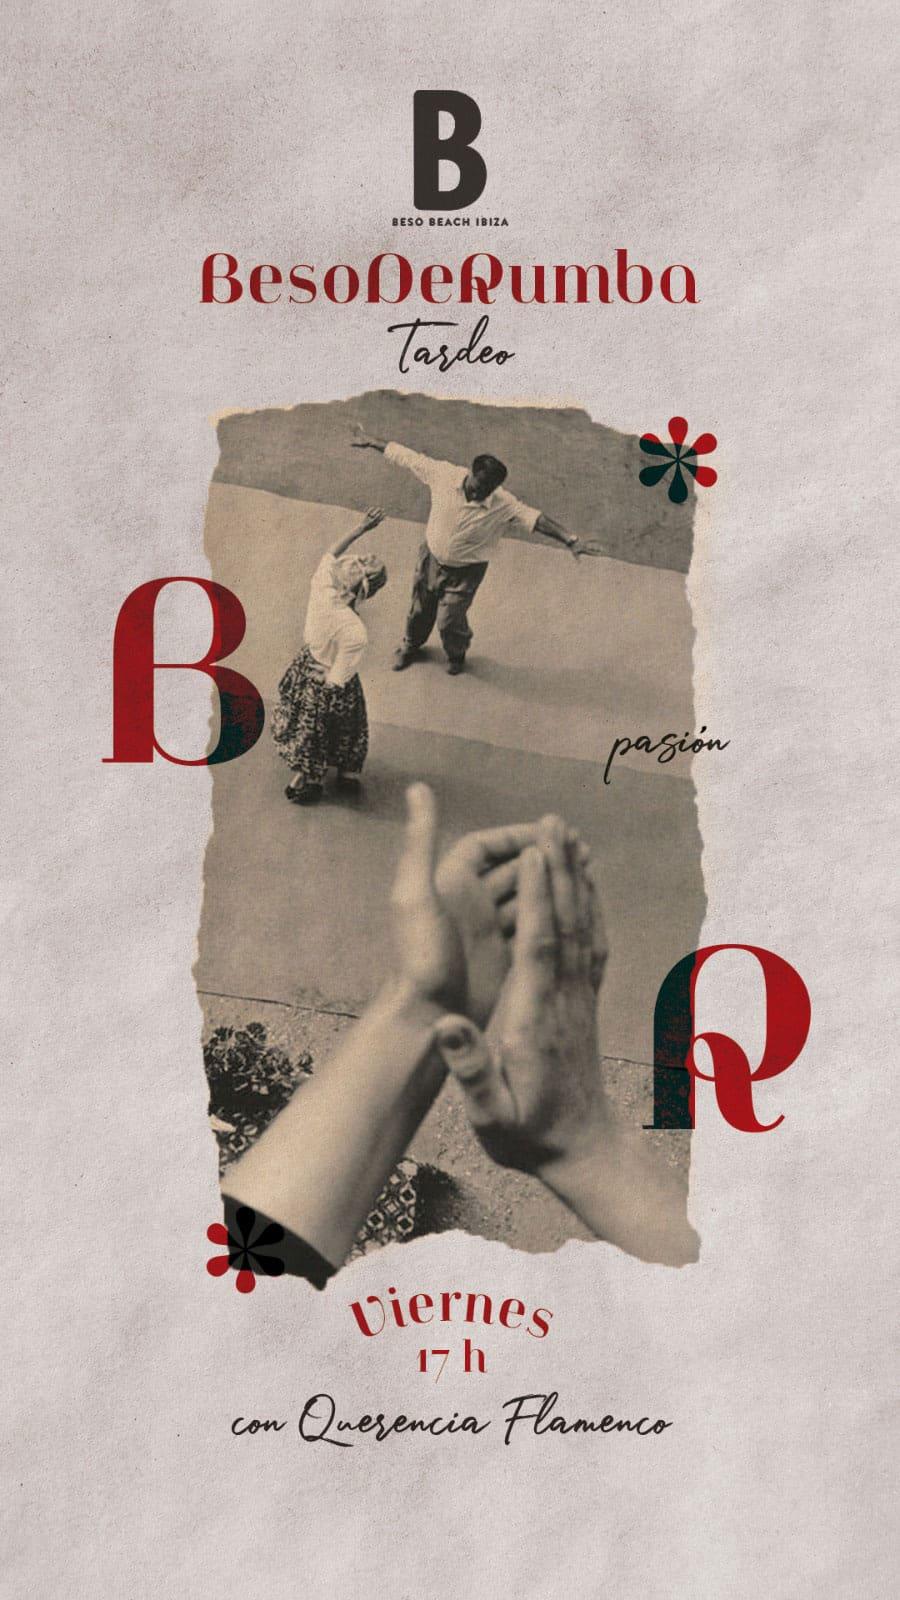 kiss-of-rumba-afternoon-kiss-beach-ibiza-2021-welcometoibiza